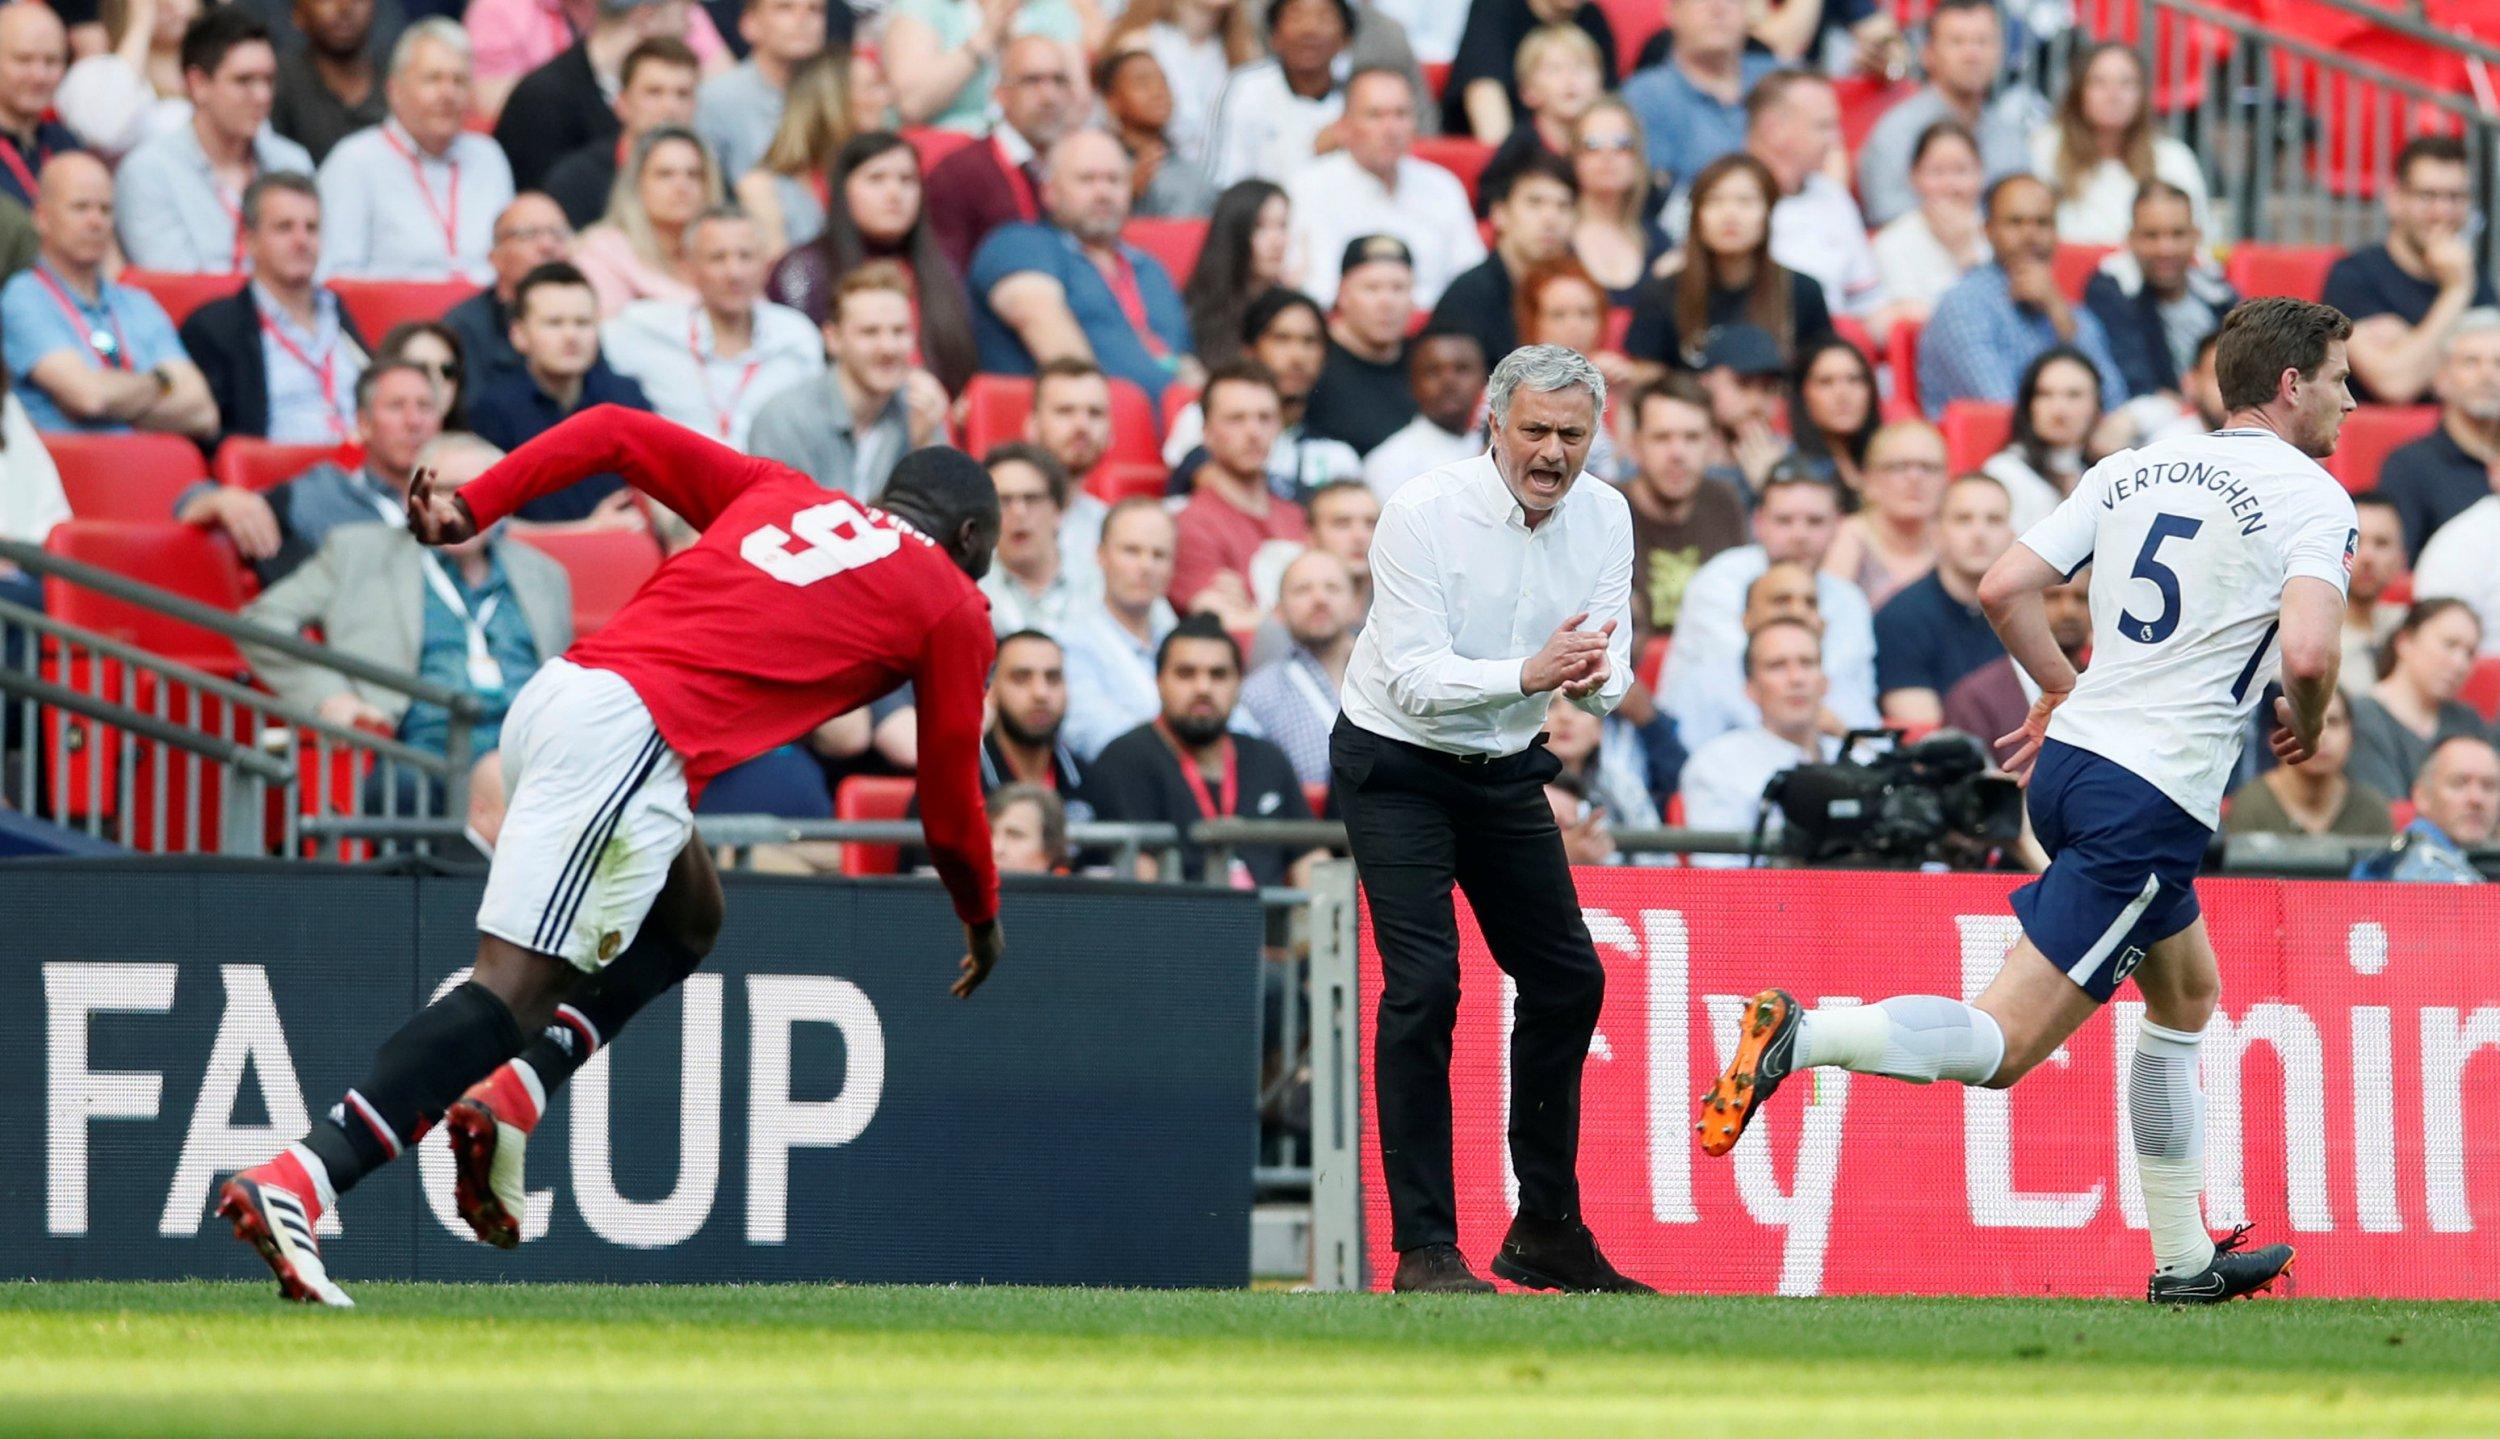 Soccer Football - FA Cup Semi-Final - Manchester United v Tottenham Hotspur - Wembley Stadium, London, Britain - April 21, 2018 Manchester United manager Jose Mourinho REUTERS/David Klein